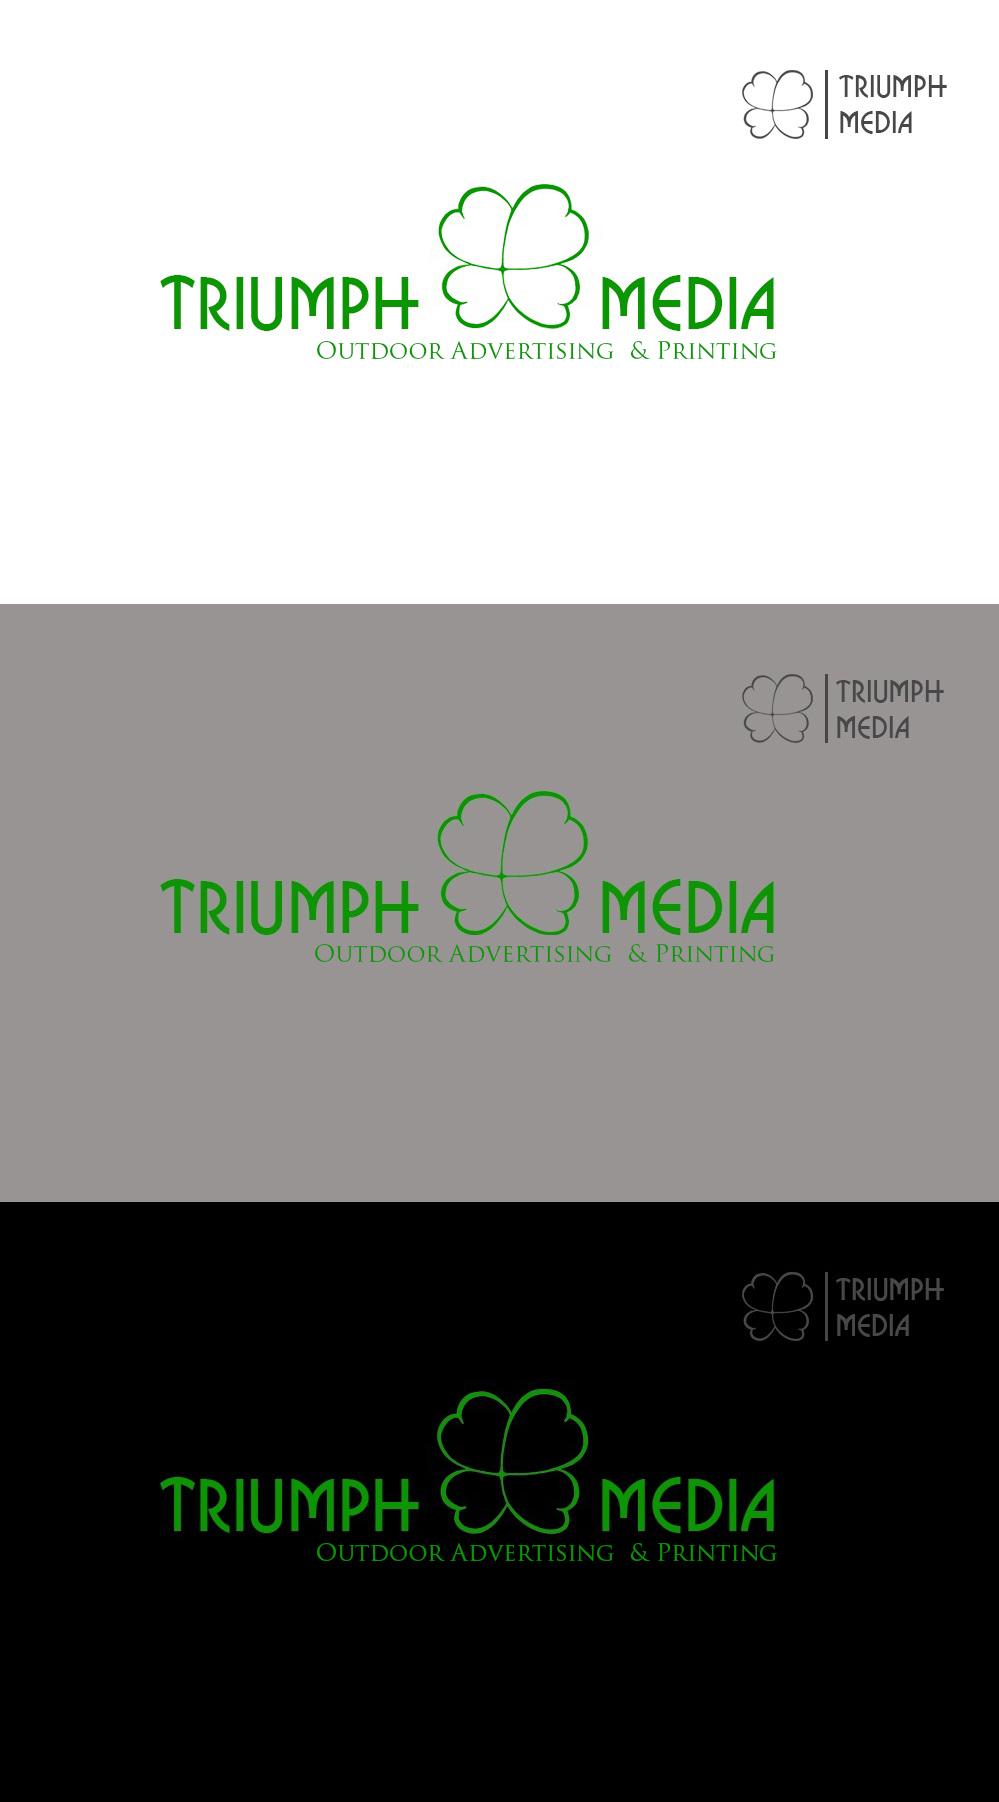 Разработка логотипа  TRIUMPH MEDIA с изображением клевера фото f_507318ca36747.jpg